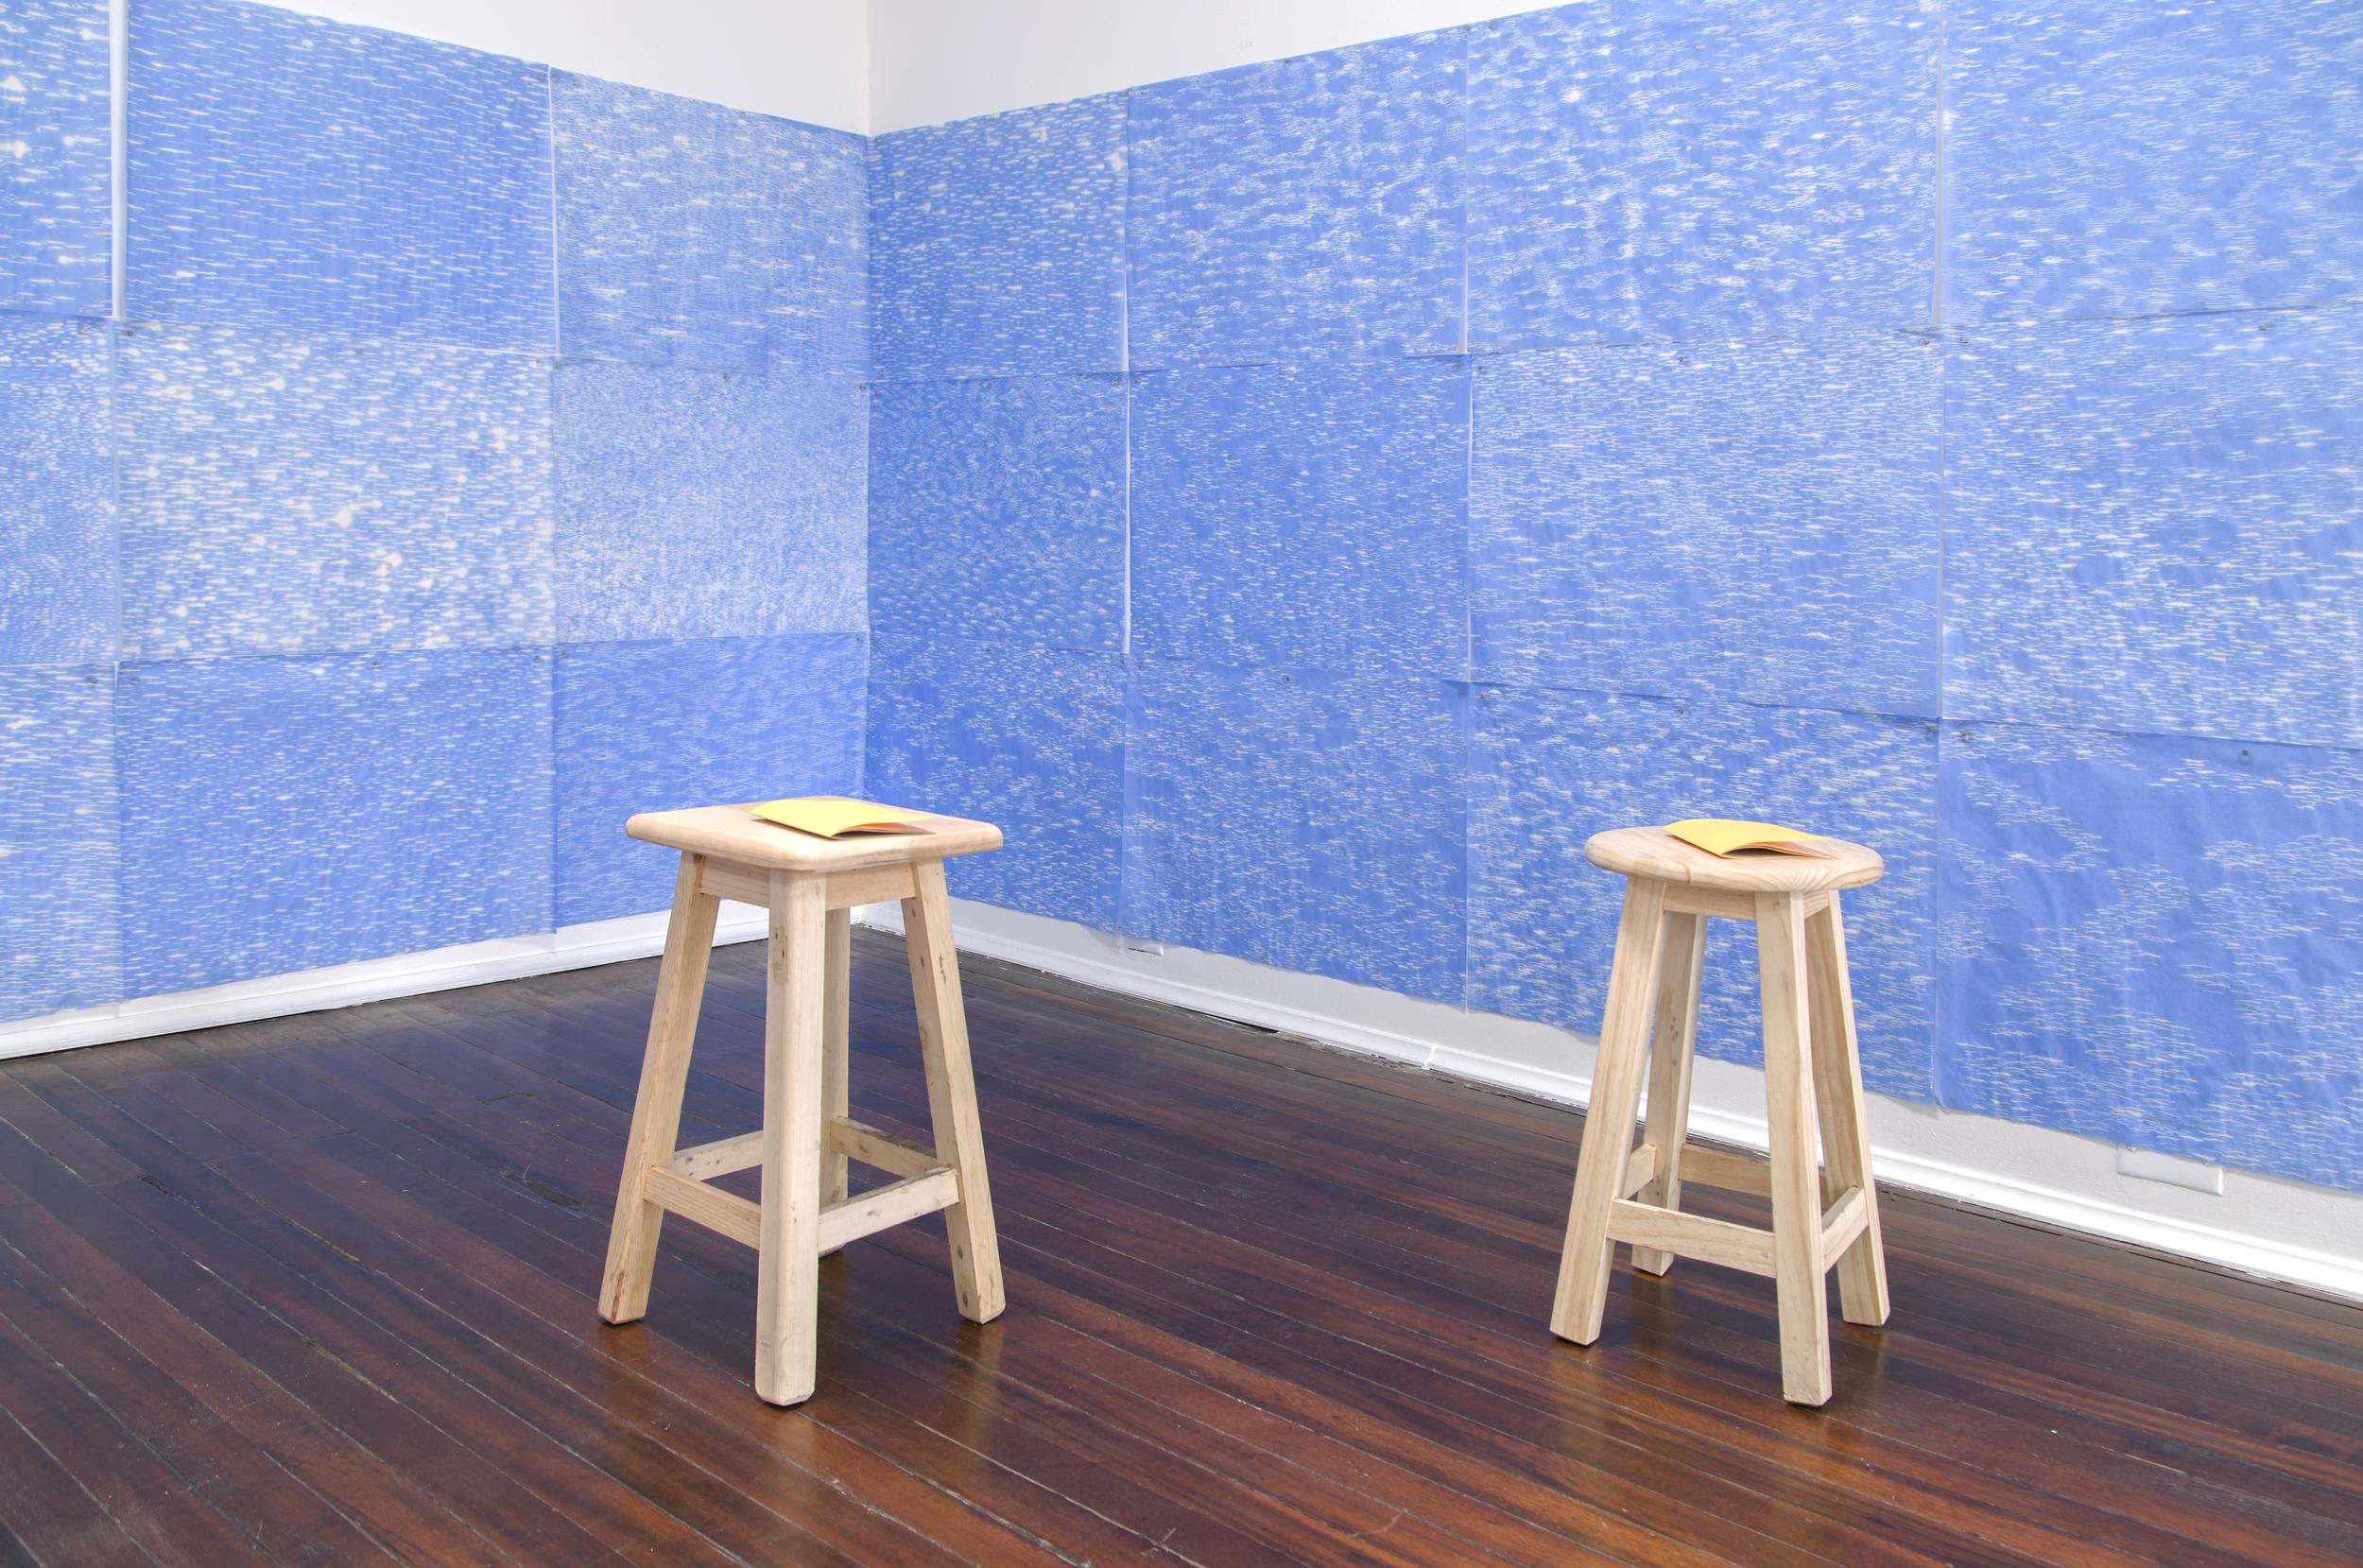 "A CONTRALUZ, 2014  Exhibición individual, vista de sala tercer piso.  ""A contraluz""   hipoclorito de sodio sobre papel de seda   Medidas variables   2014"